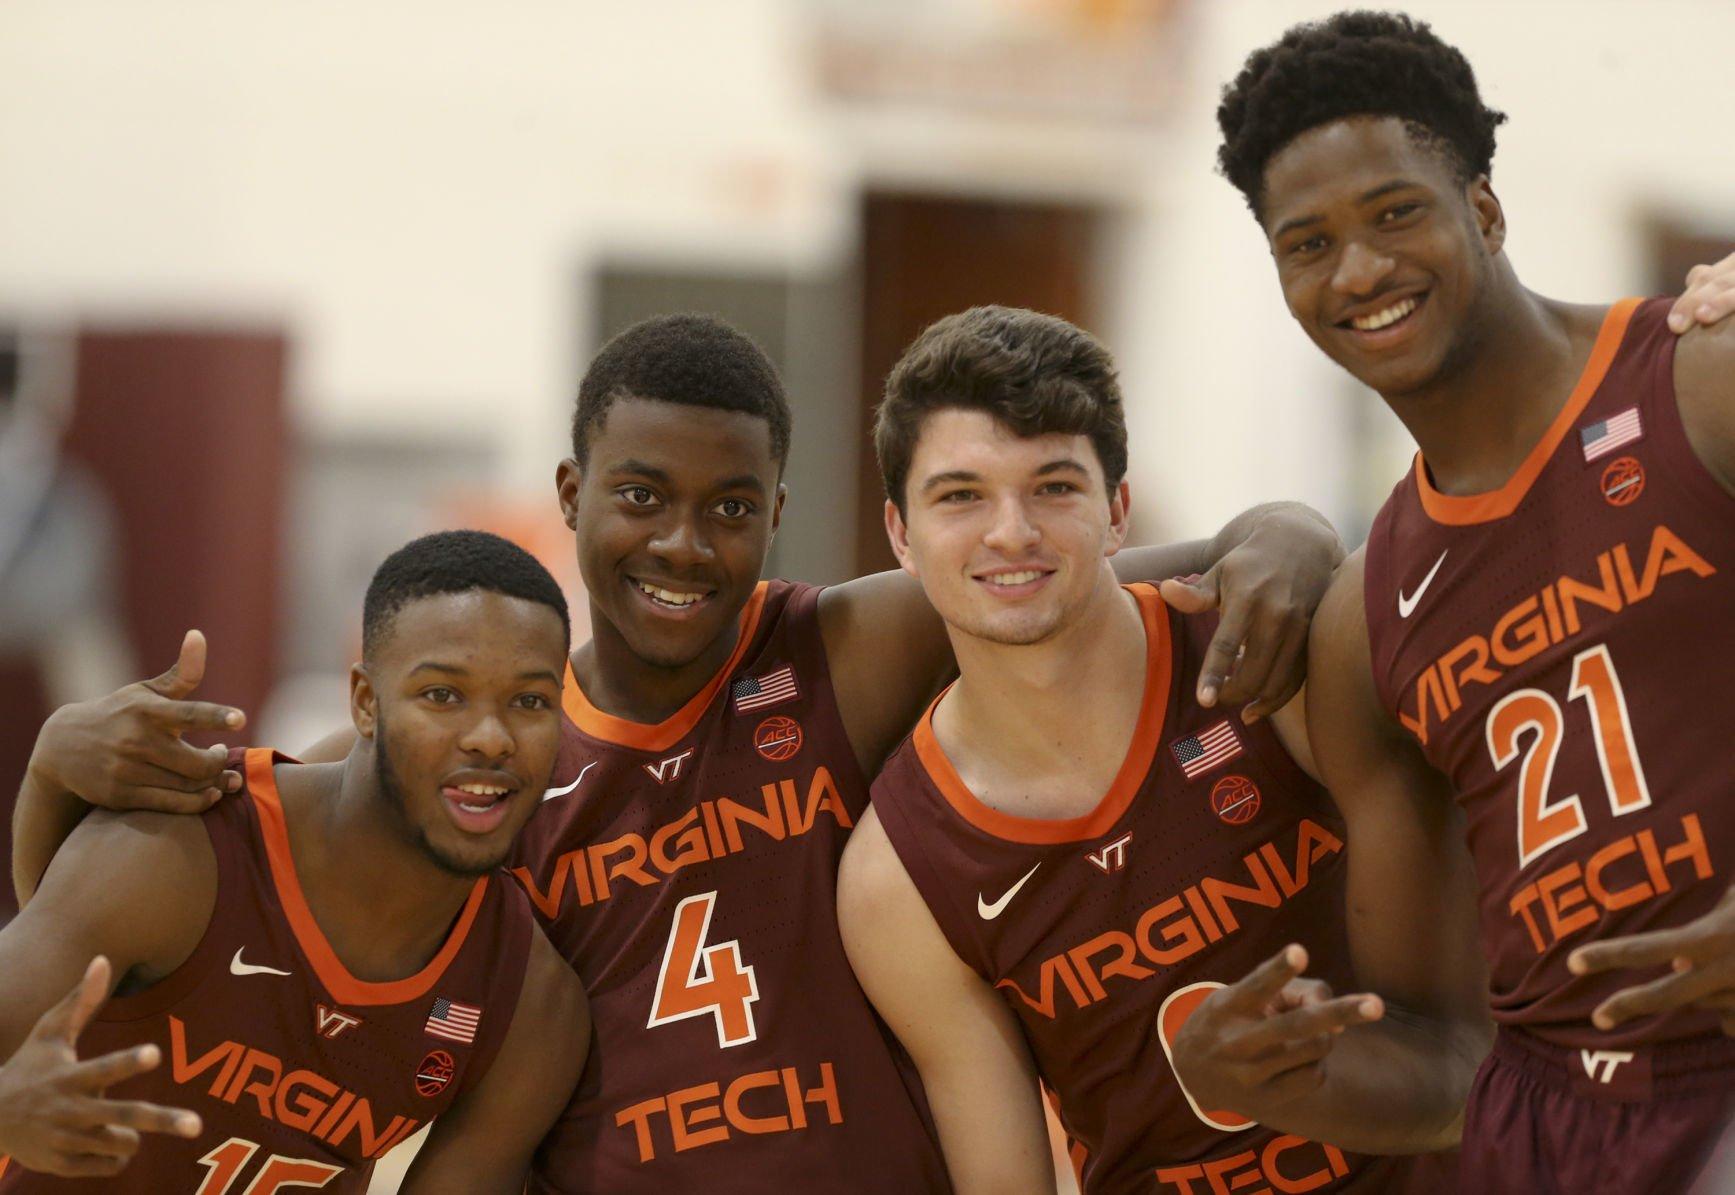 virginia tech basketball jersey